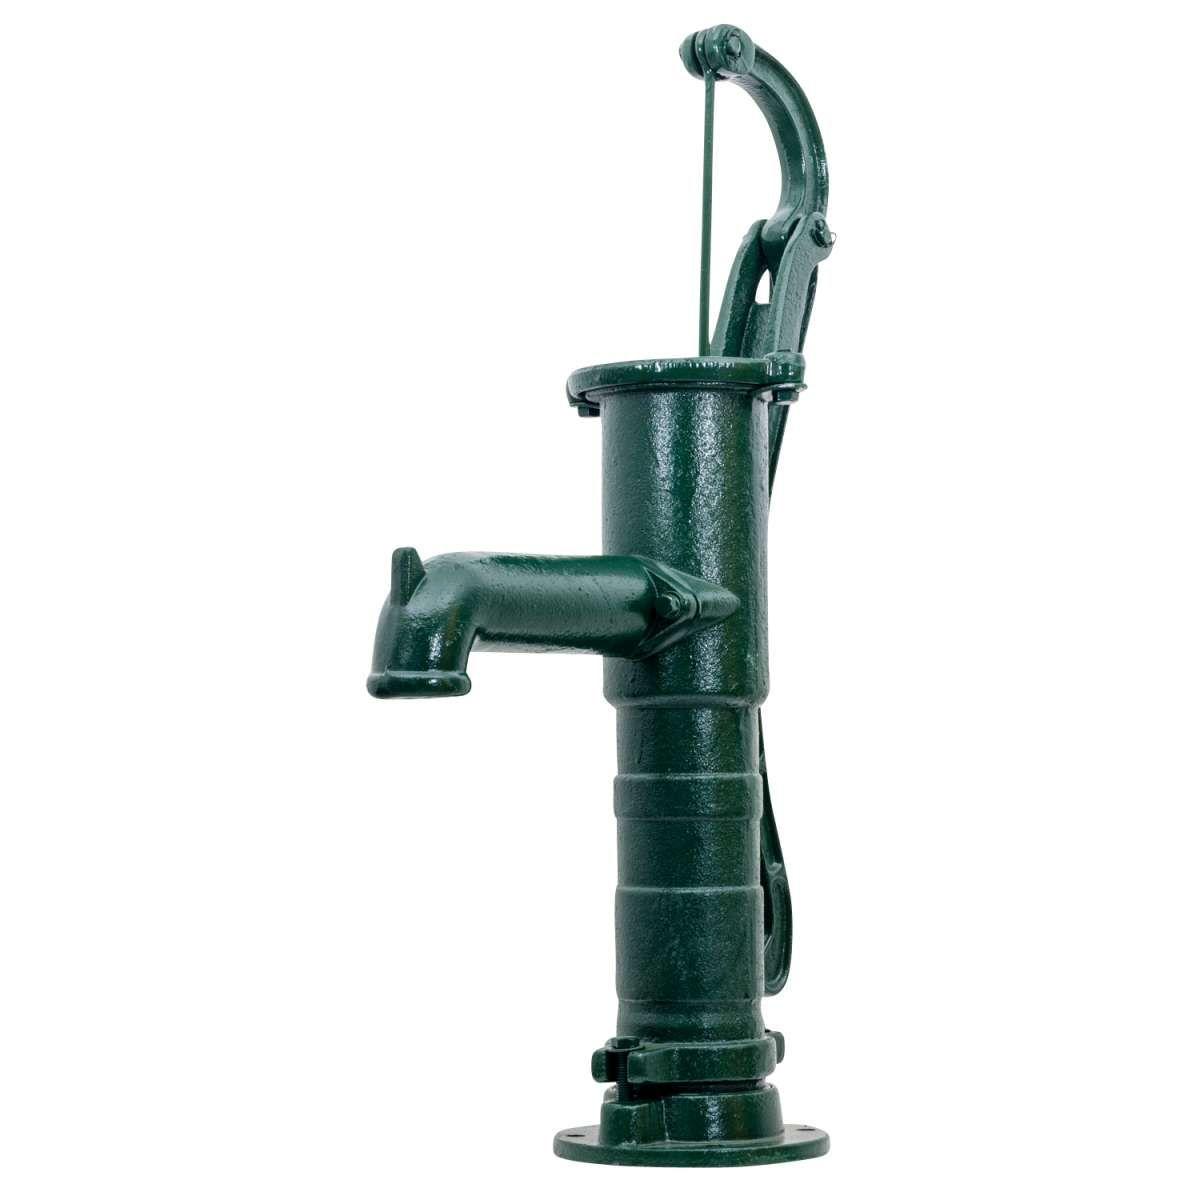 Schwengelpumpe Gartenpumpe Handschwengelpumpe Wasserpumpe